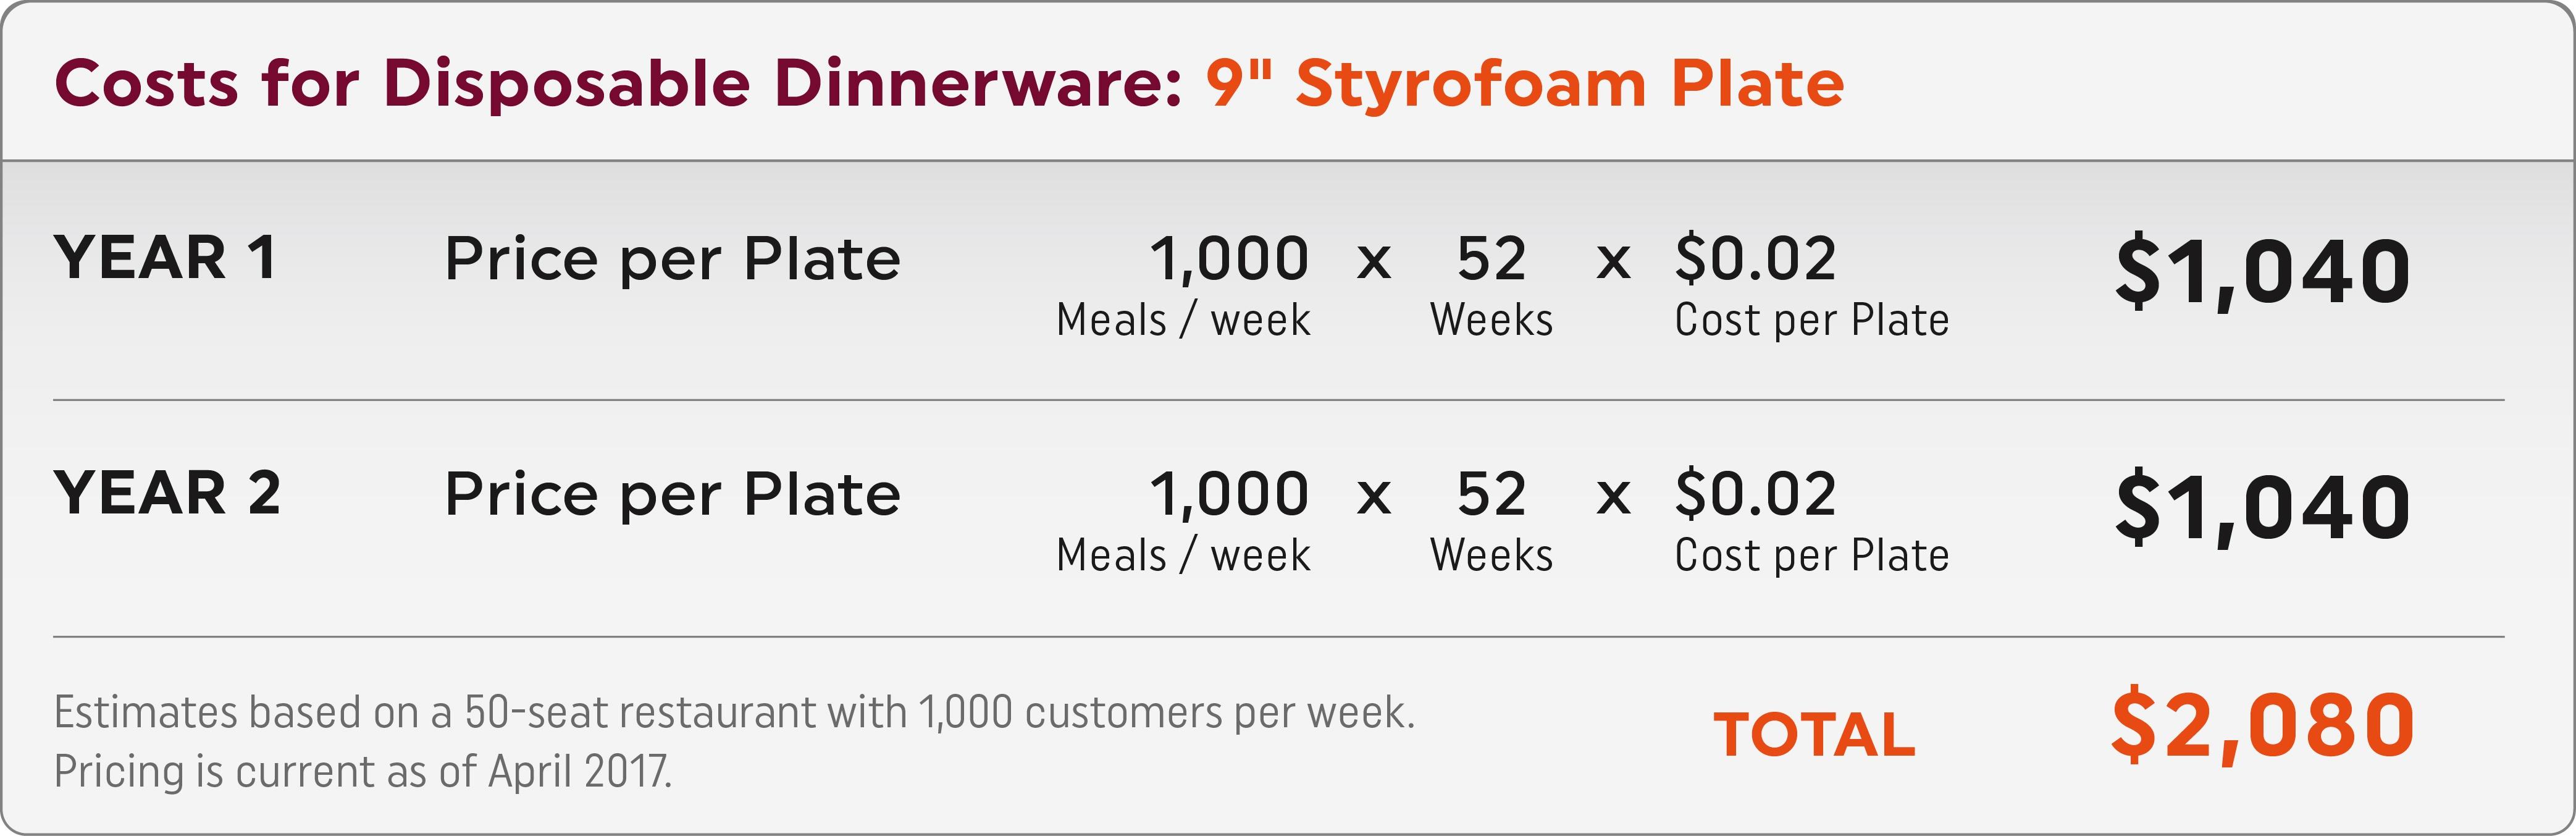 Disposable_Dinnerware_Costs.jpg